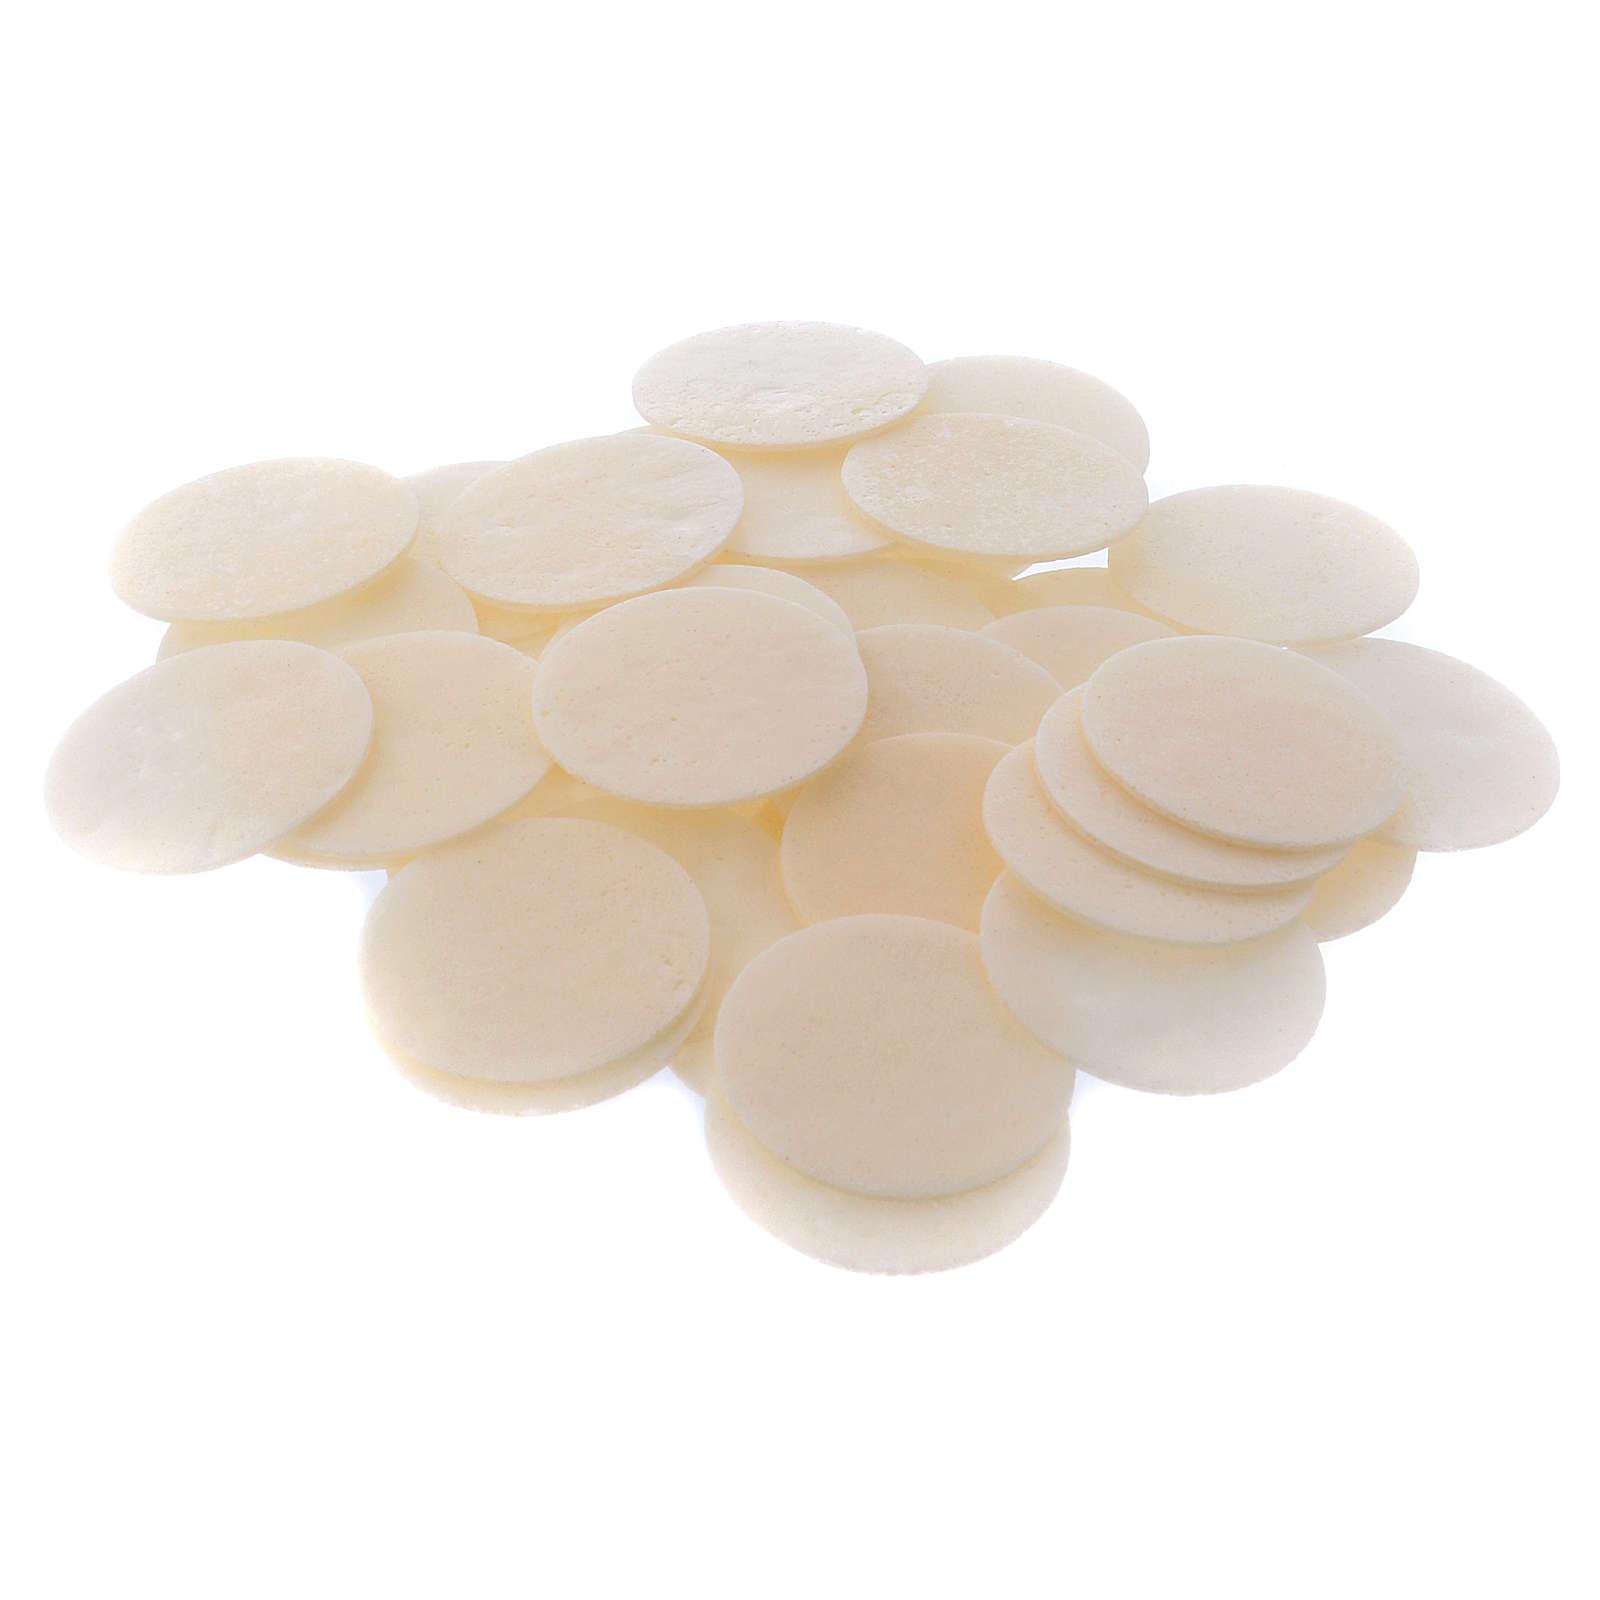 Particles 3.5cm diameter with closed edges (500 pieces) 3